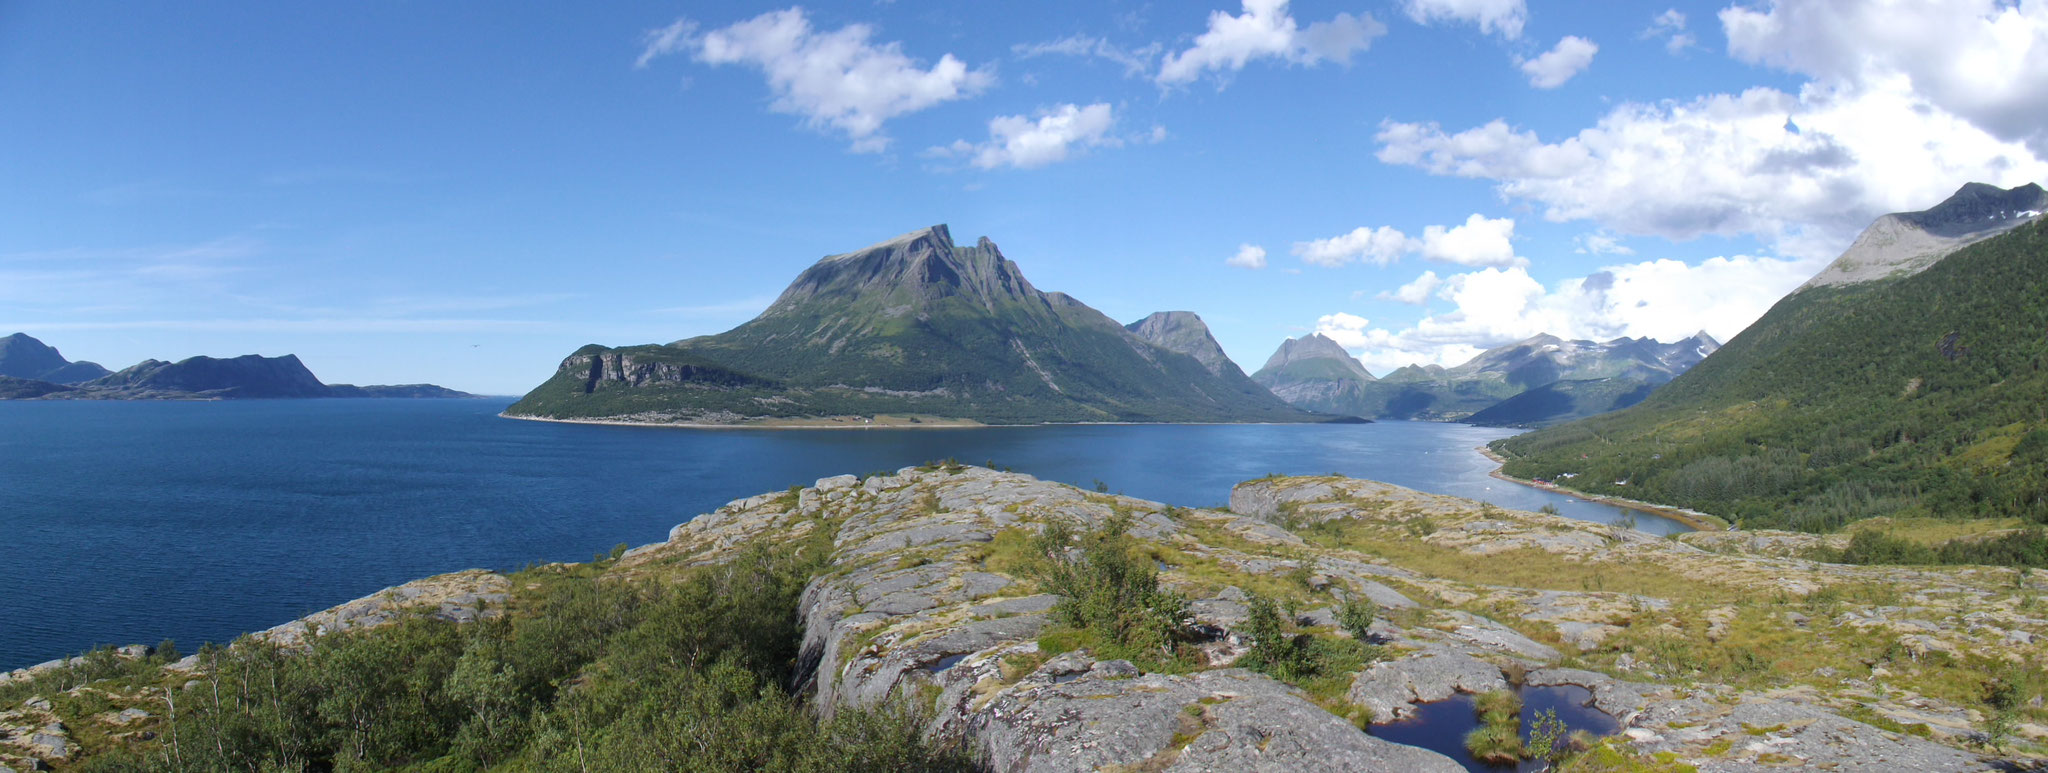 Kystvei nach Bodø